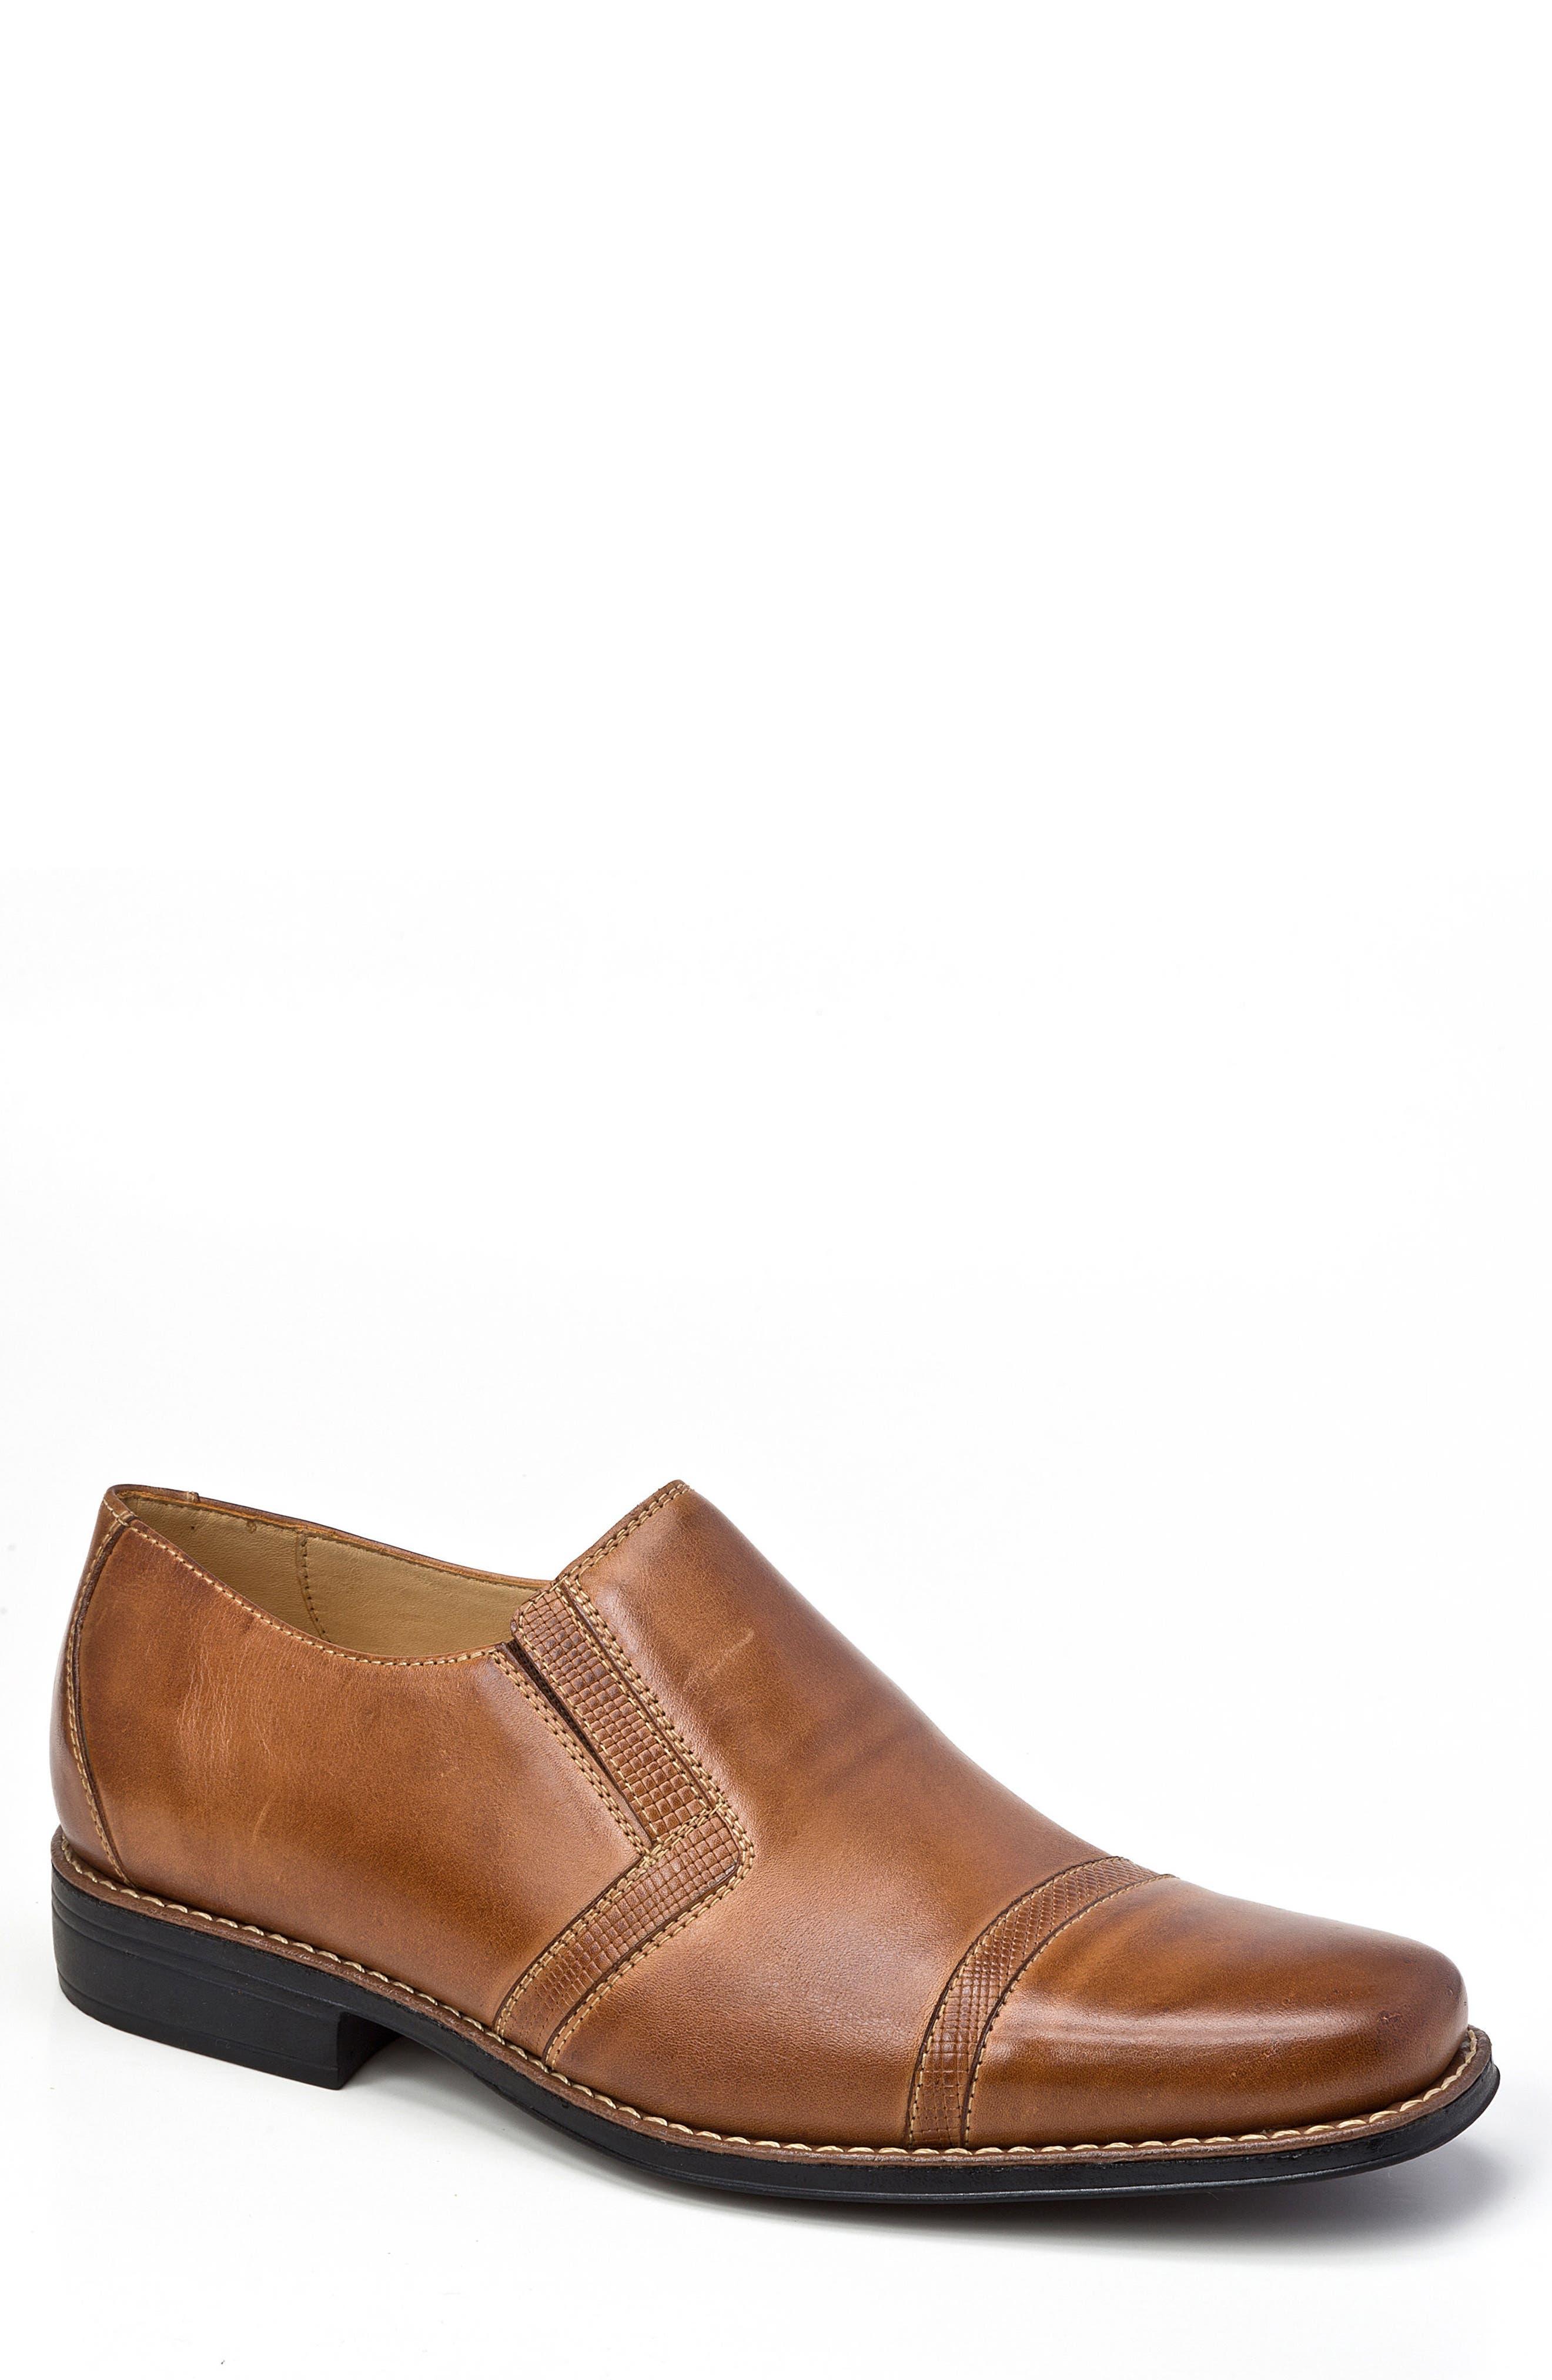 Sebastian Venetian Loafer,                         Main,                         color, Tan Leather